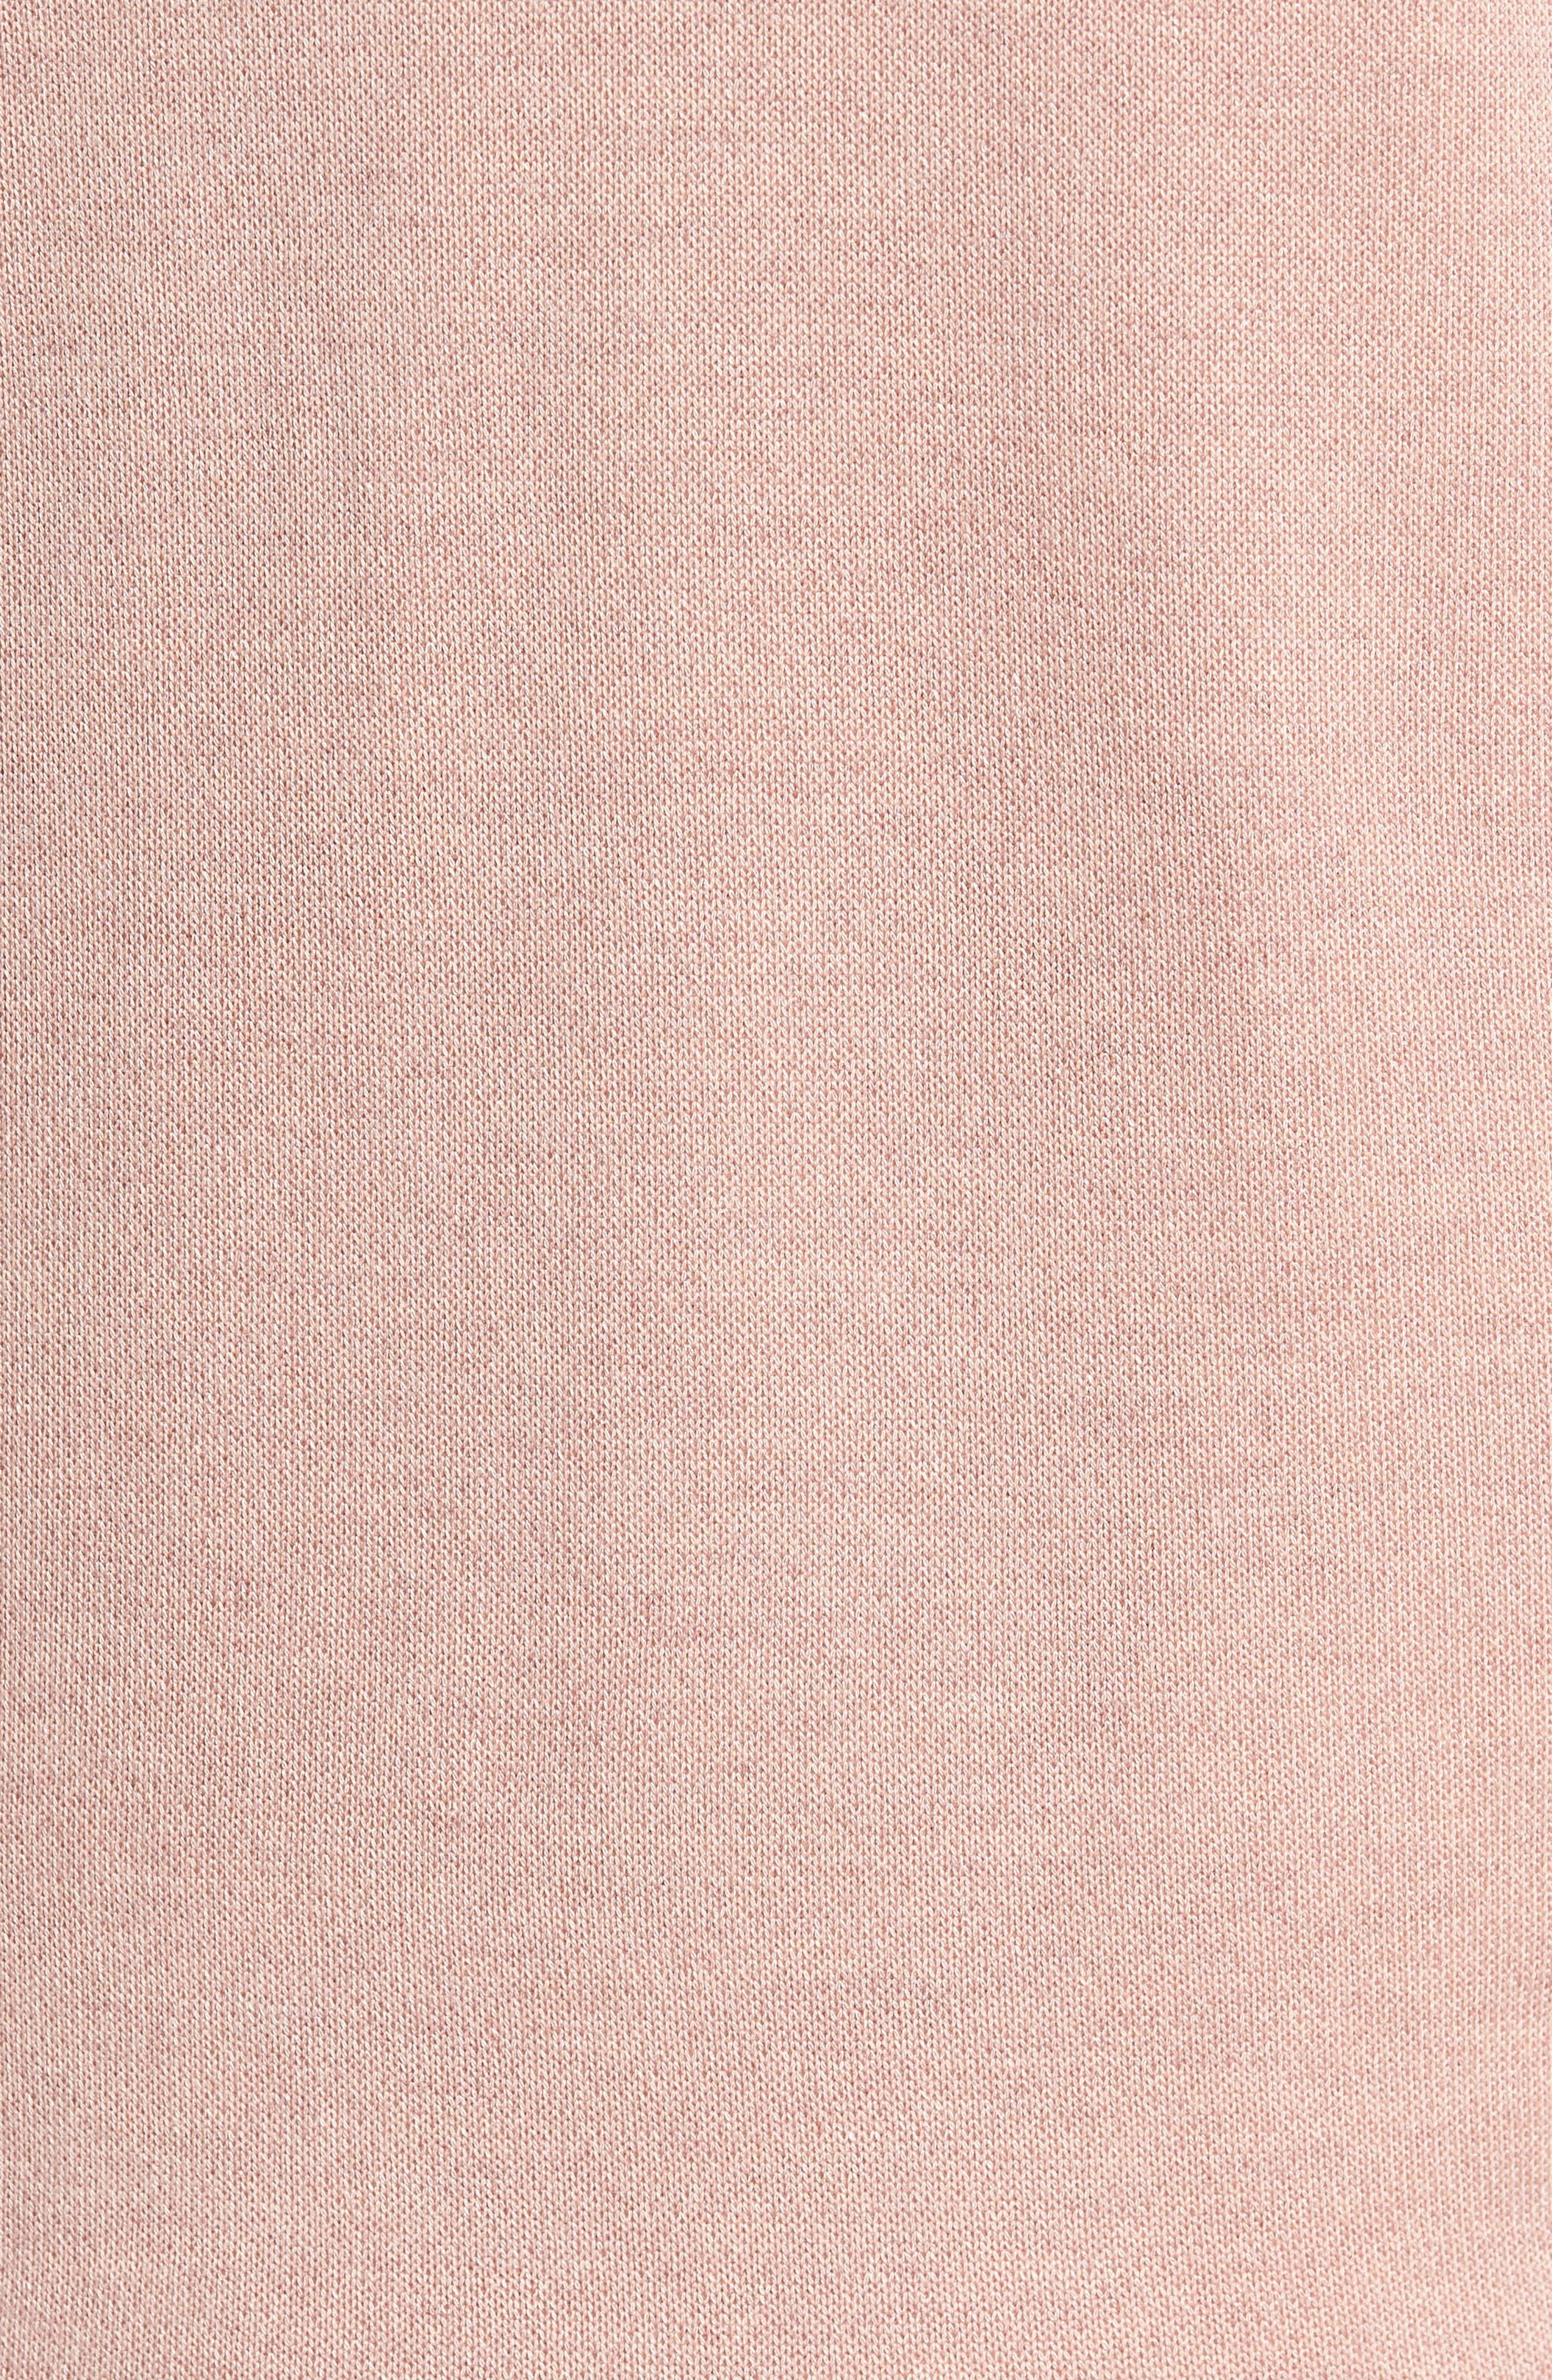 Valerio Quarter Zip Pullover,                             Alternate thumbnail 5, color,                             Dusky Pink